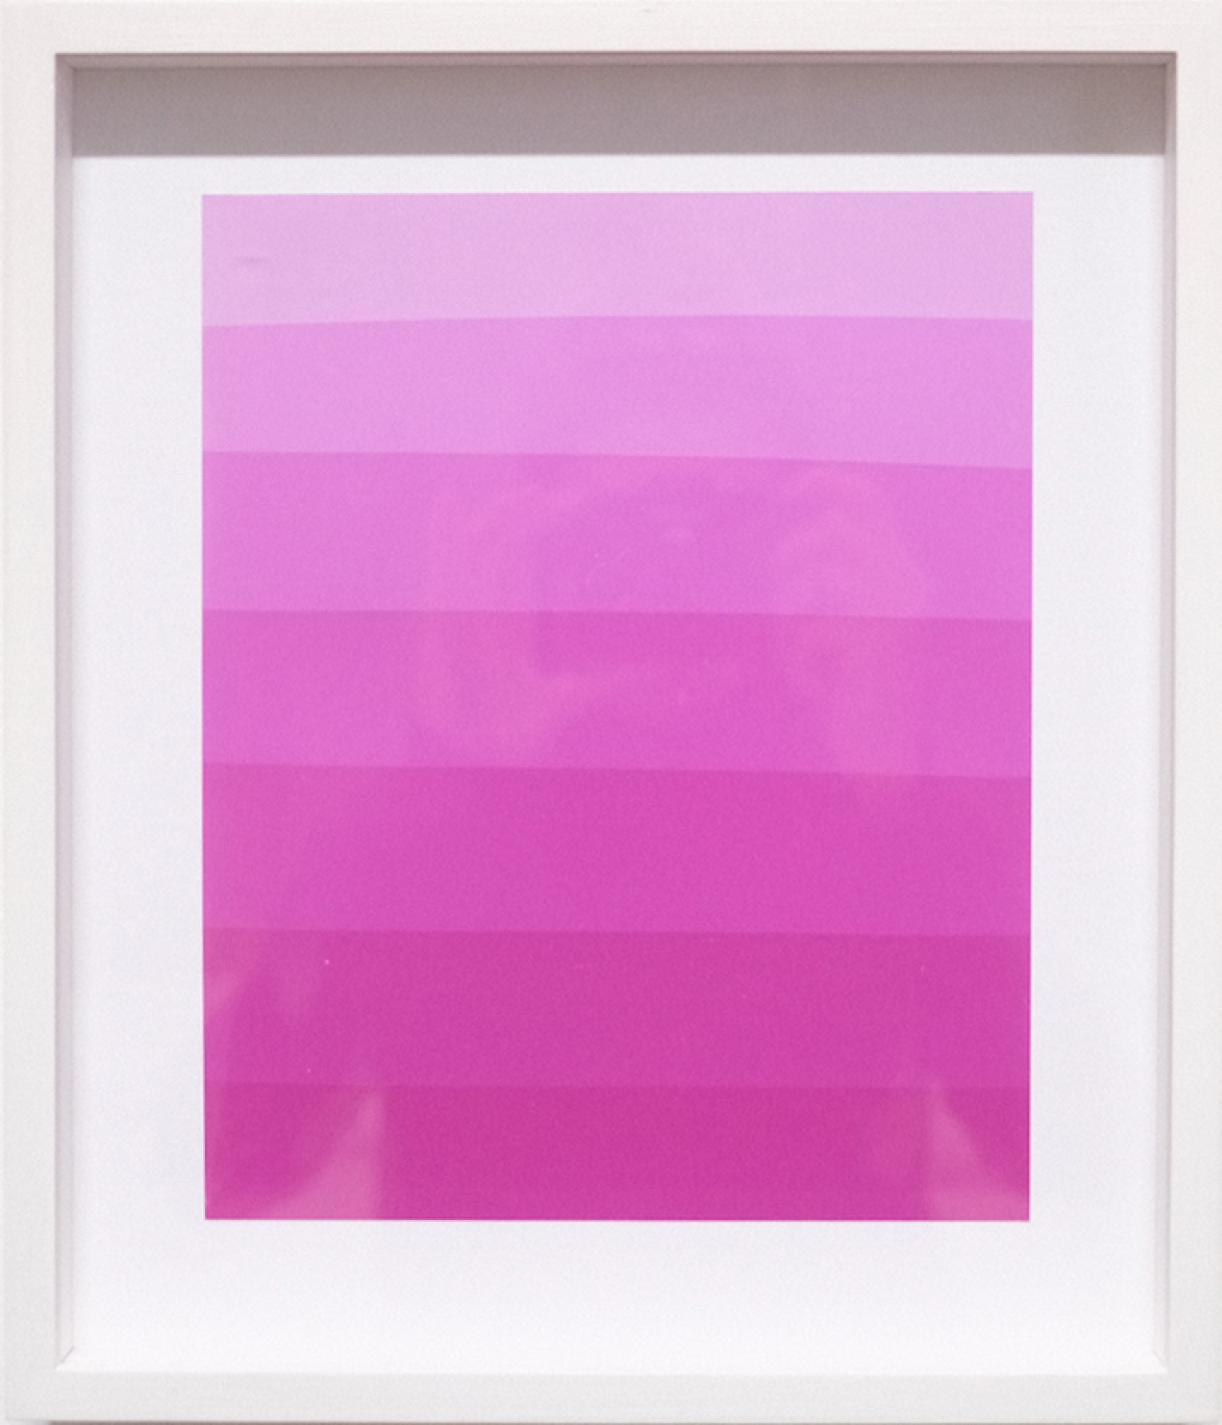 Photogram (Color gradient pink), photographic paper, 34 x 29 cm framed